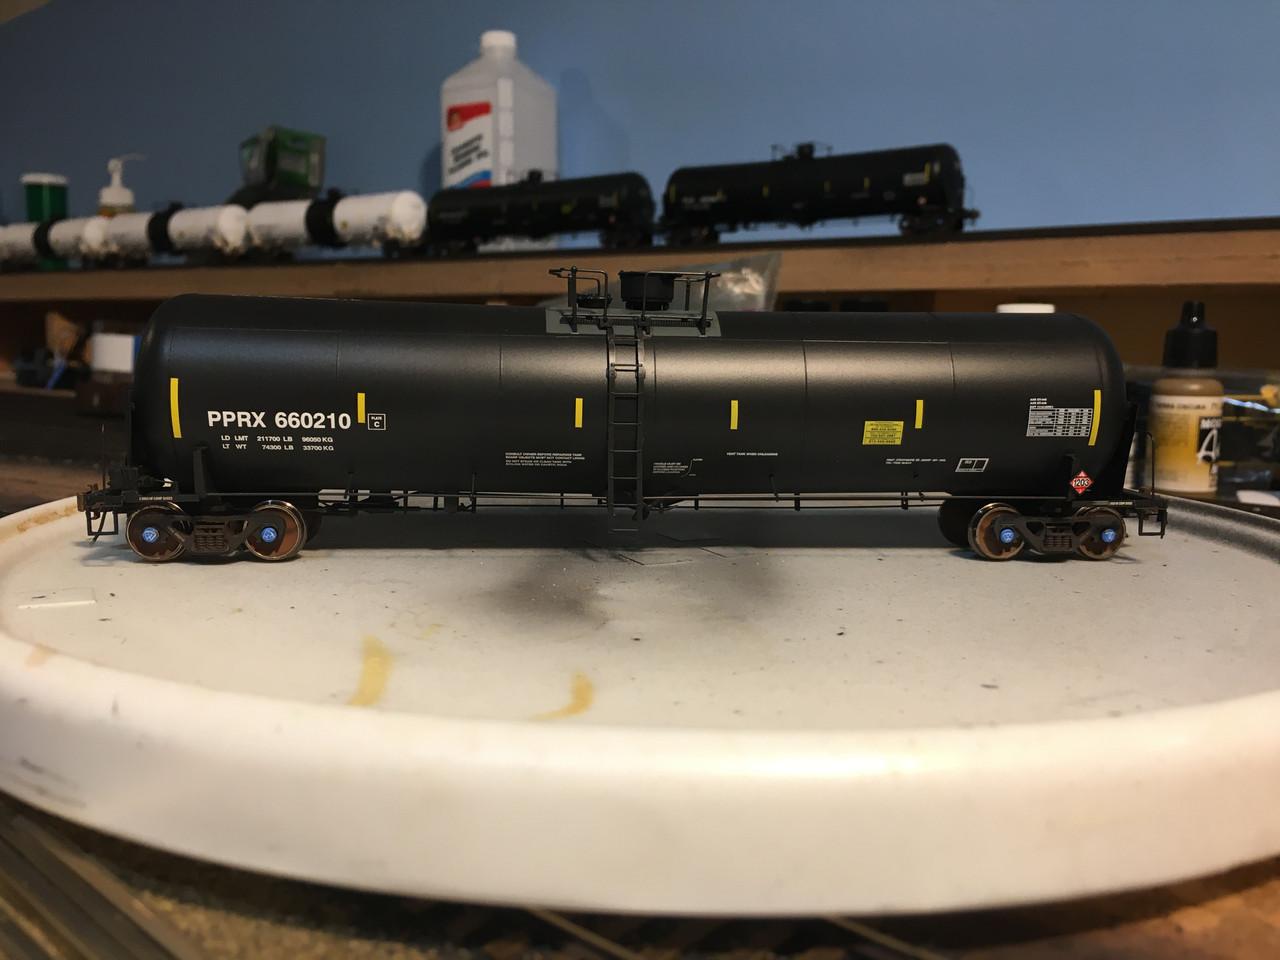 Scaletrains {SXT31639} Custom Weathered Trinity 31k Gallon Crude Oil - Phillips 66 Co. PPRX #660210 (Scale=HO) Part#8003-SXT31639w